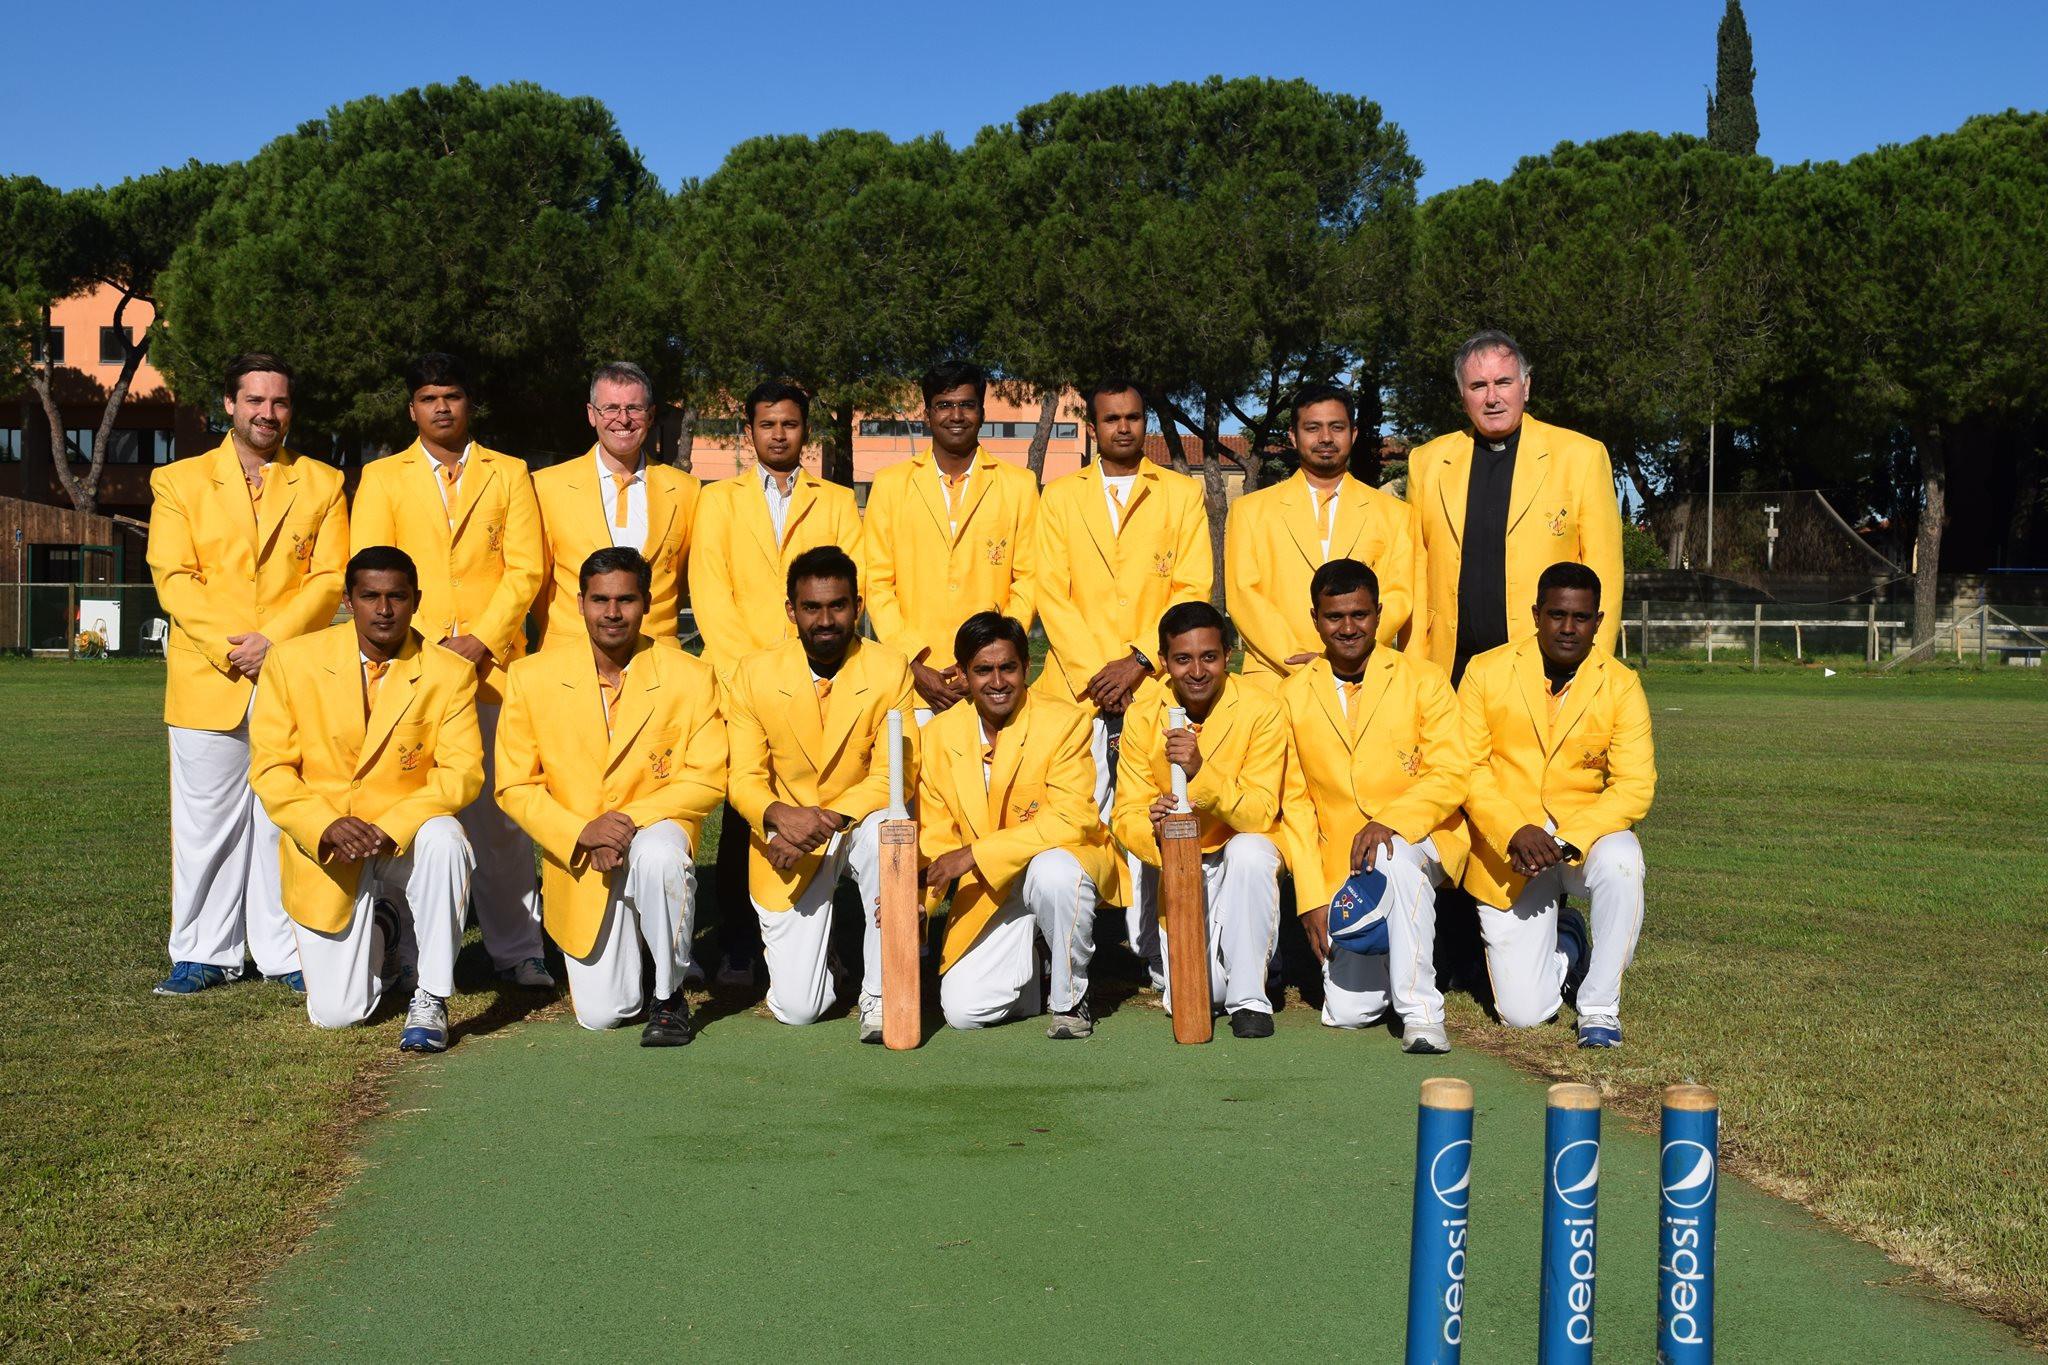 Vatican cricket team defeats British counterparts